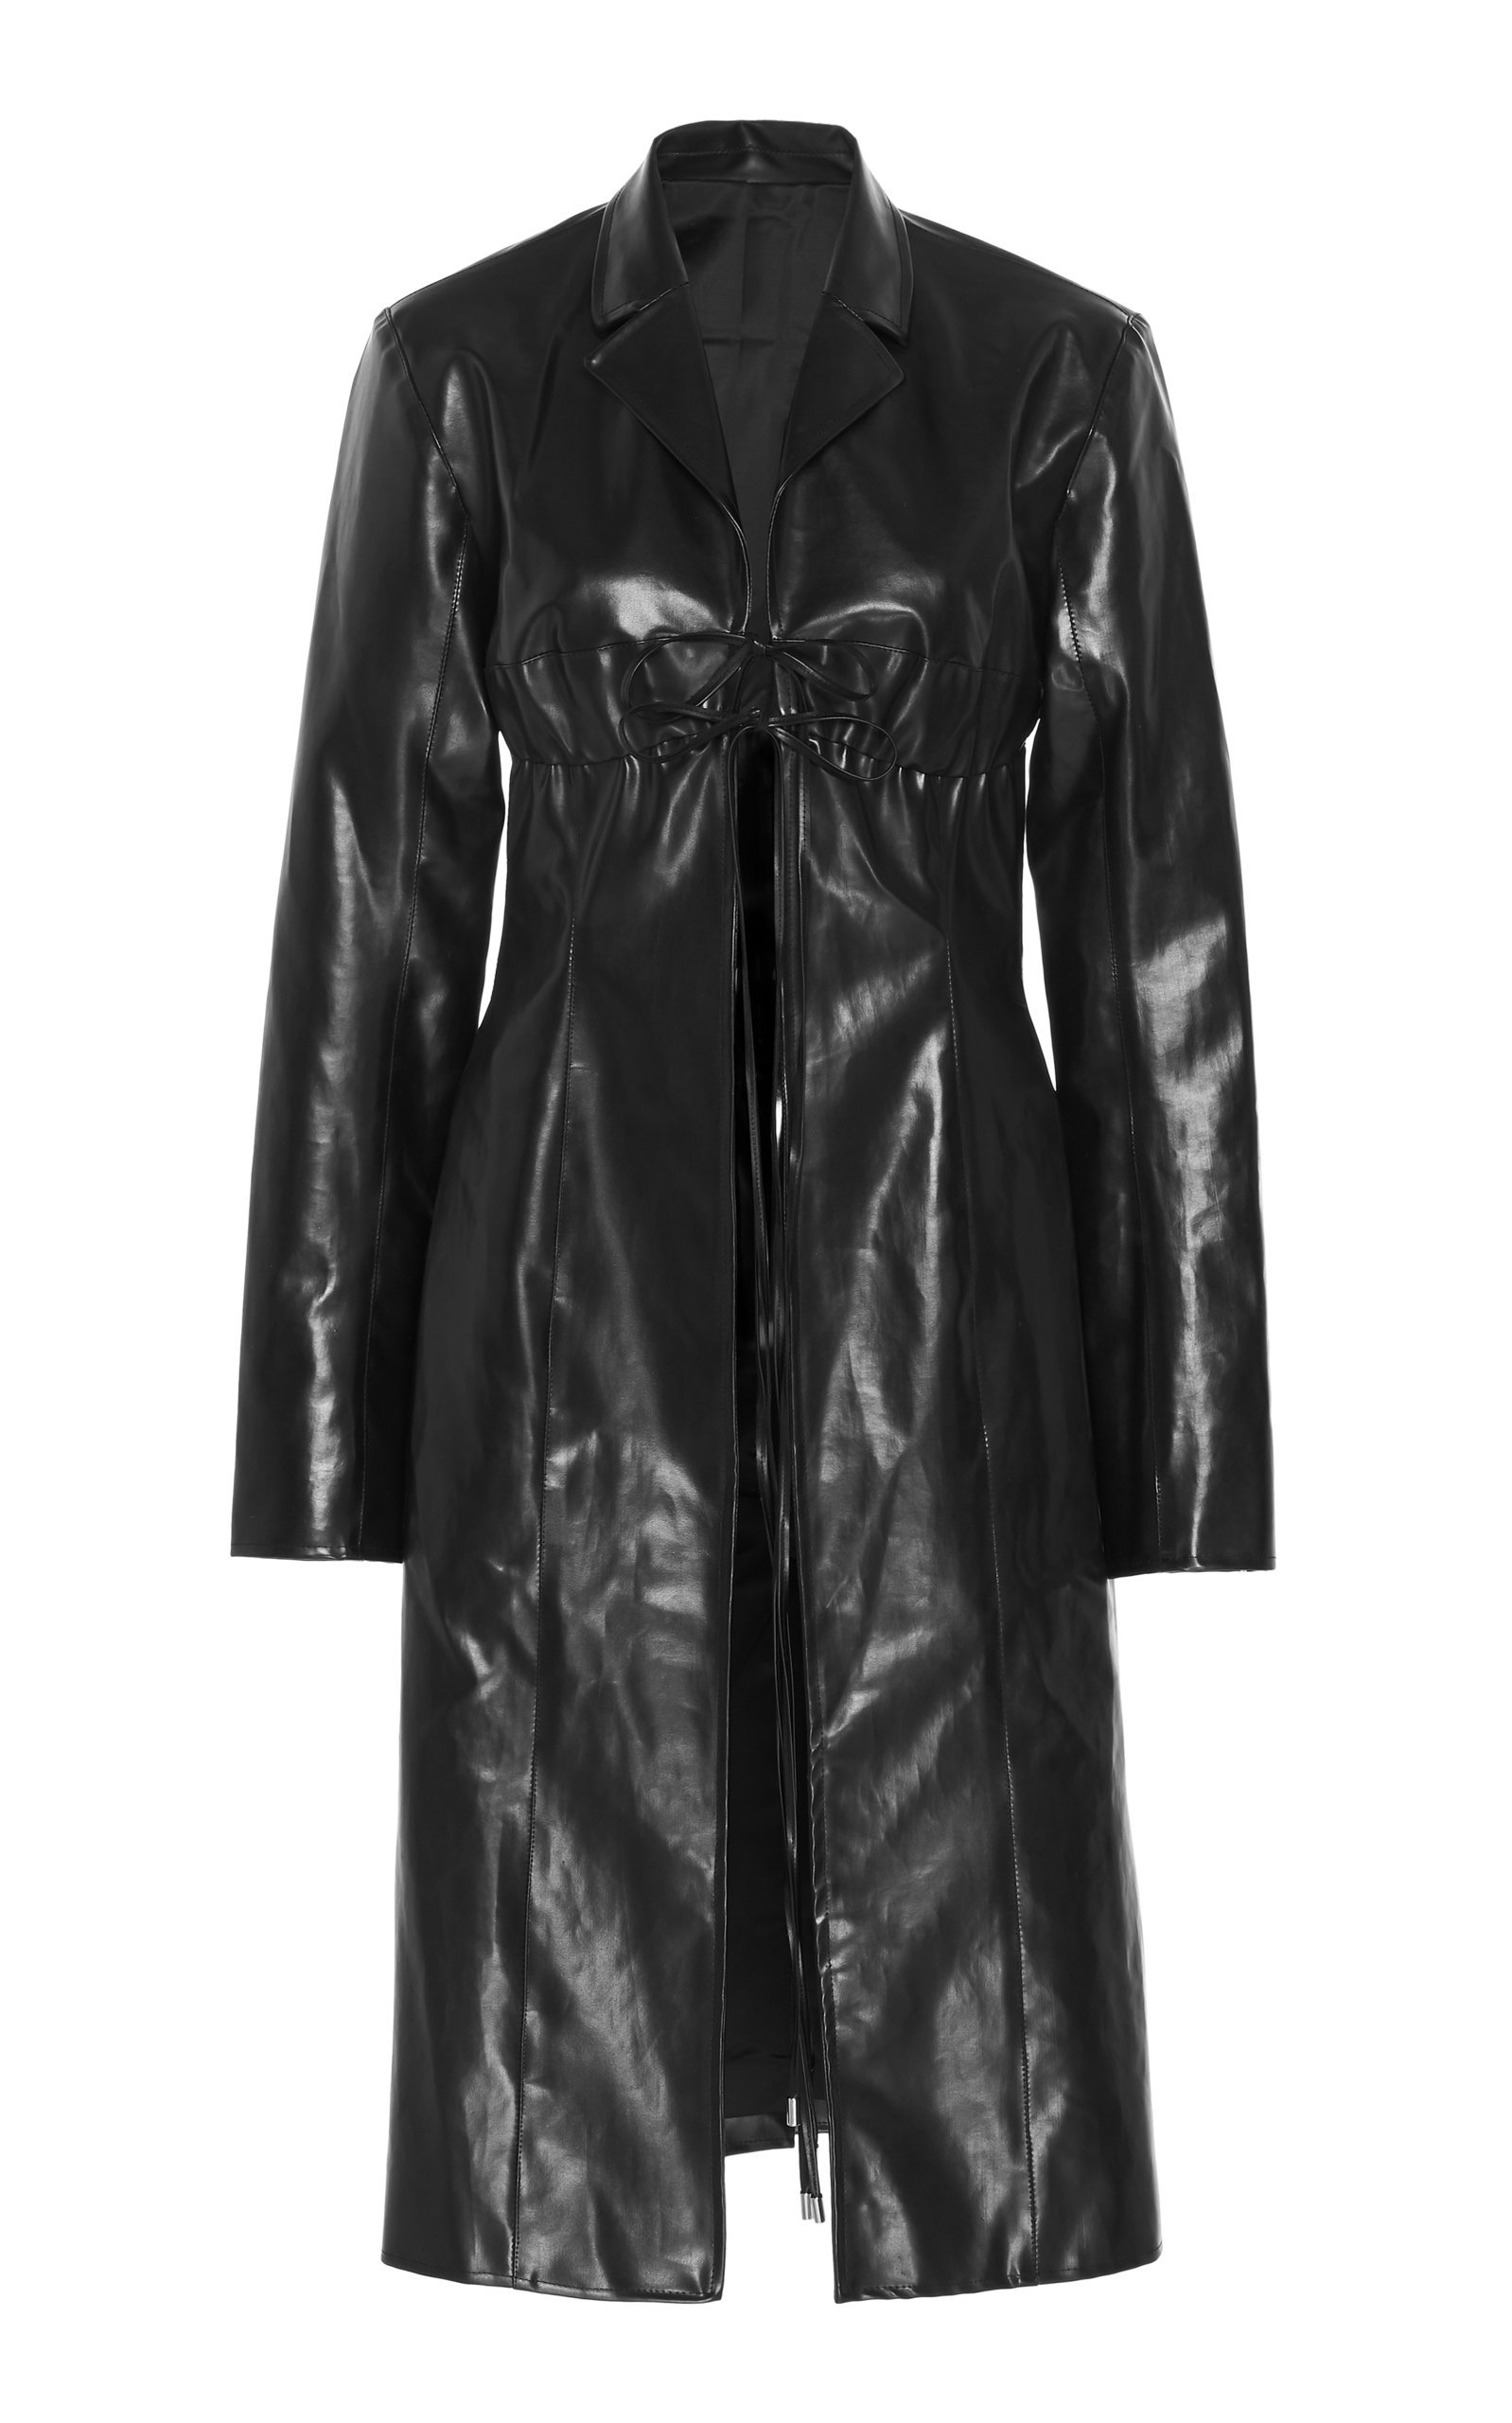 Supriya Lele Vinyl Trench Coat Size: M